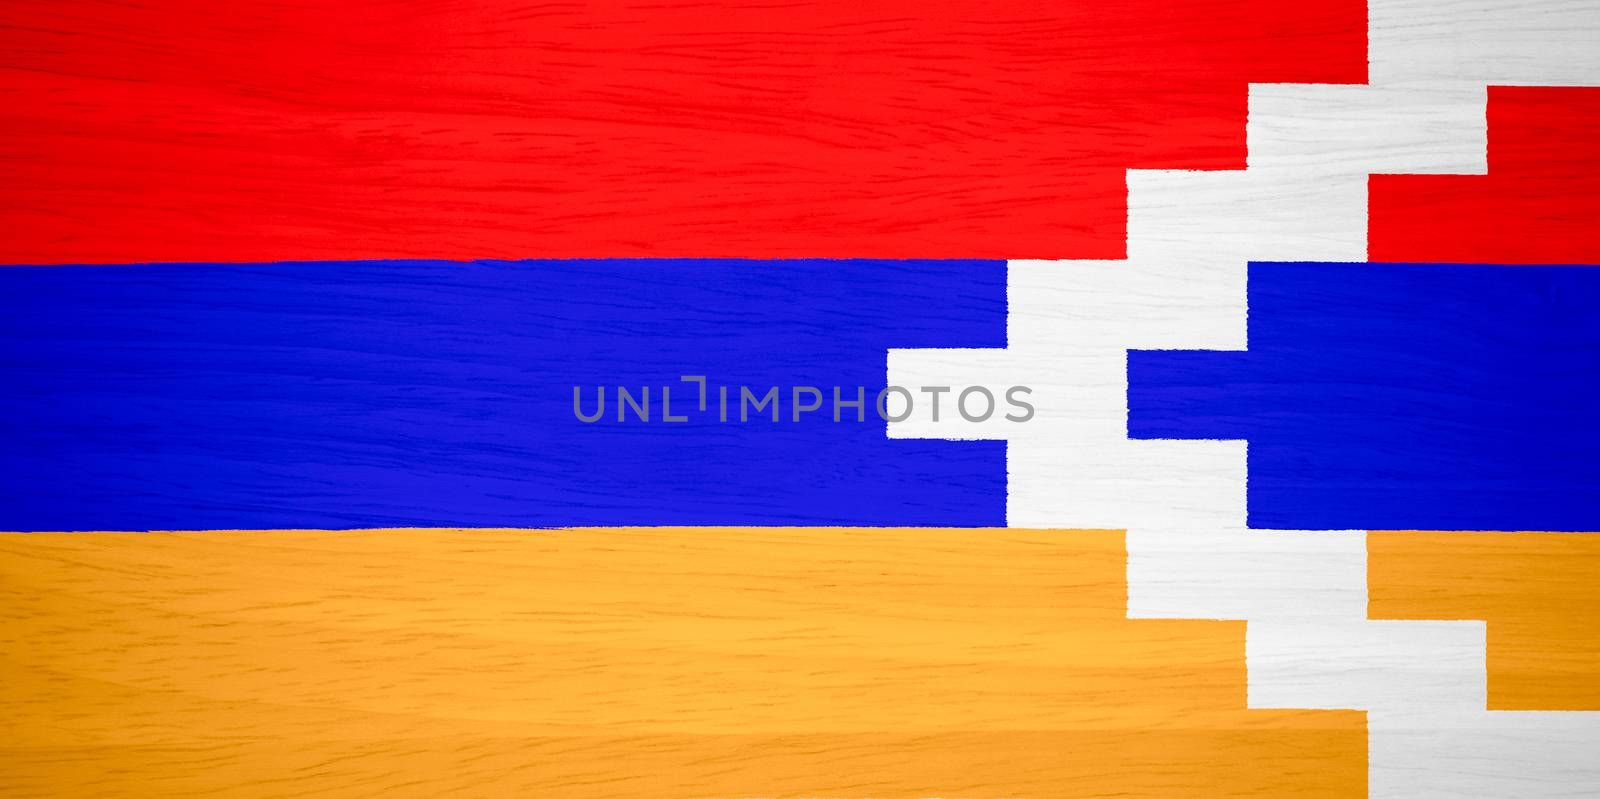 Nagorno-Karabakh Republic flag on wood texture